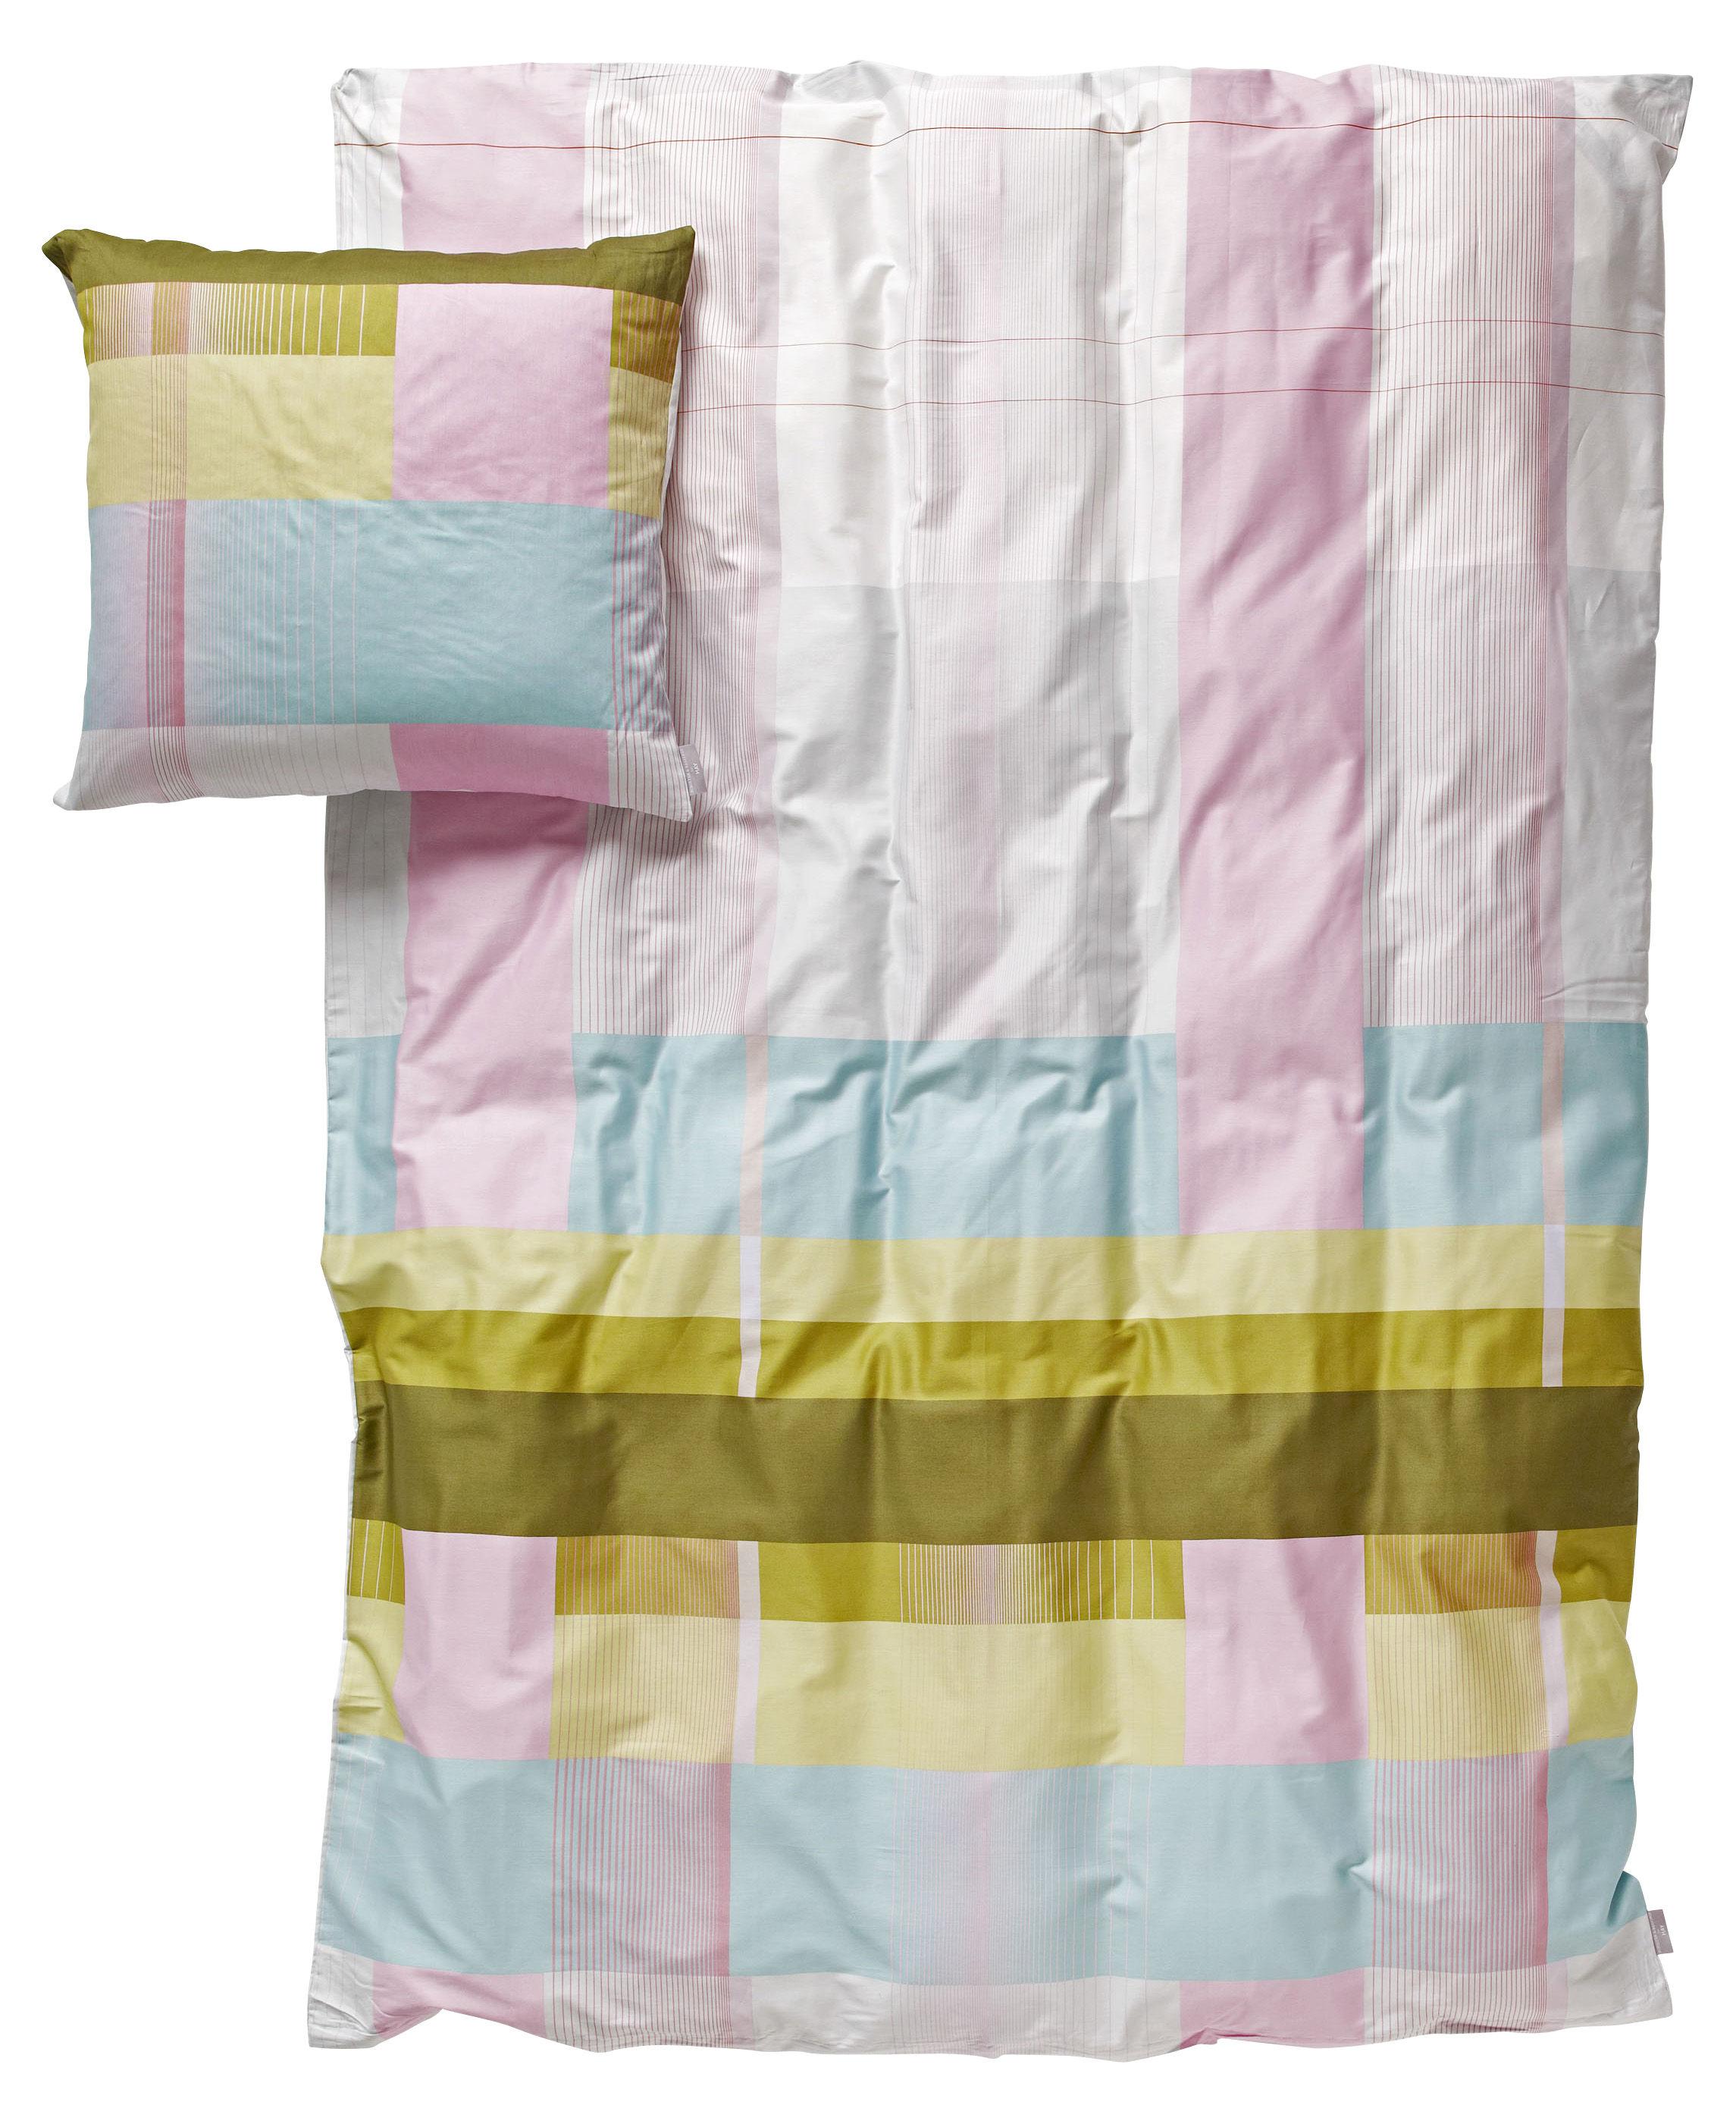 Hay Bettwäsche s b colour block bedlinen set for 1 person for one 140 x 200 cm